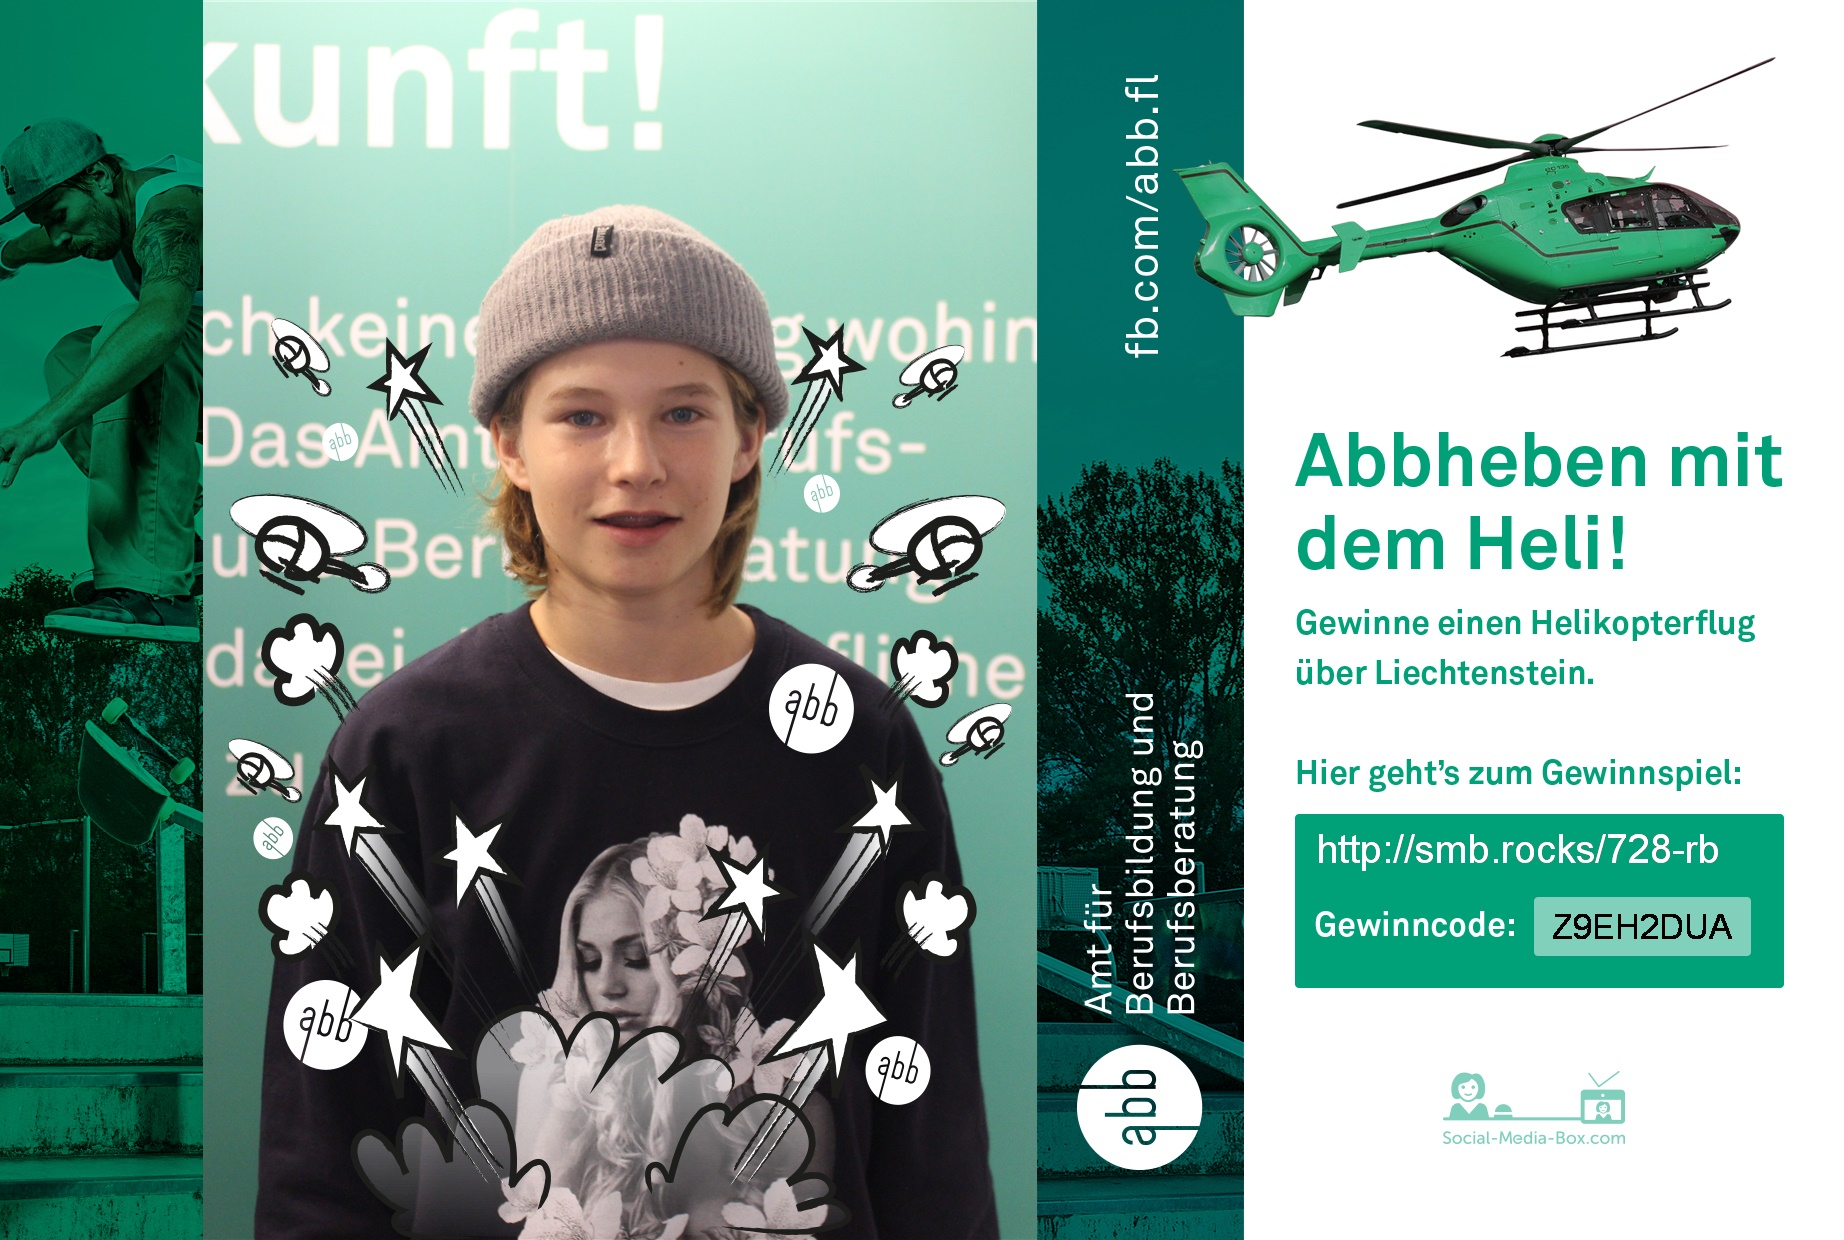 Zeughaus_ABB_next-step_Social-Media-Box_Print3